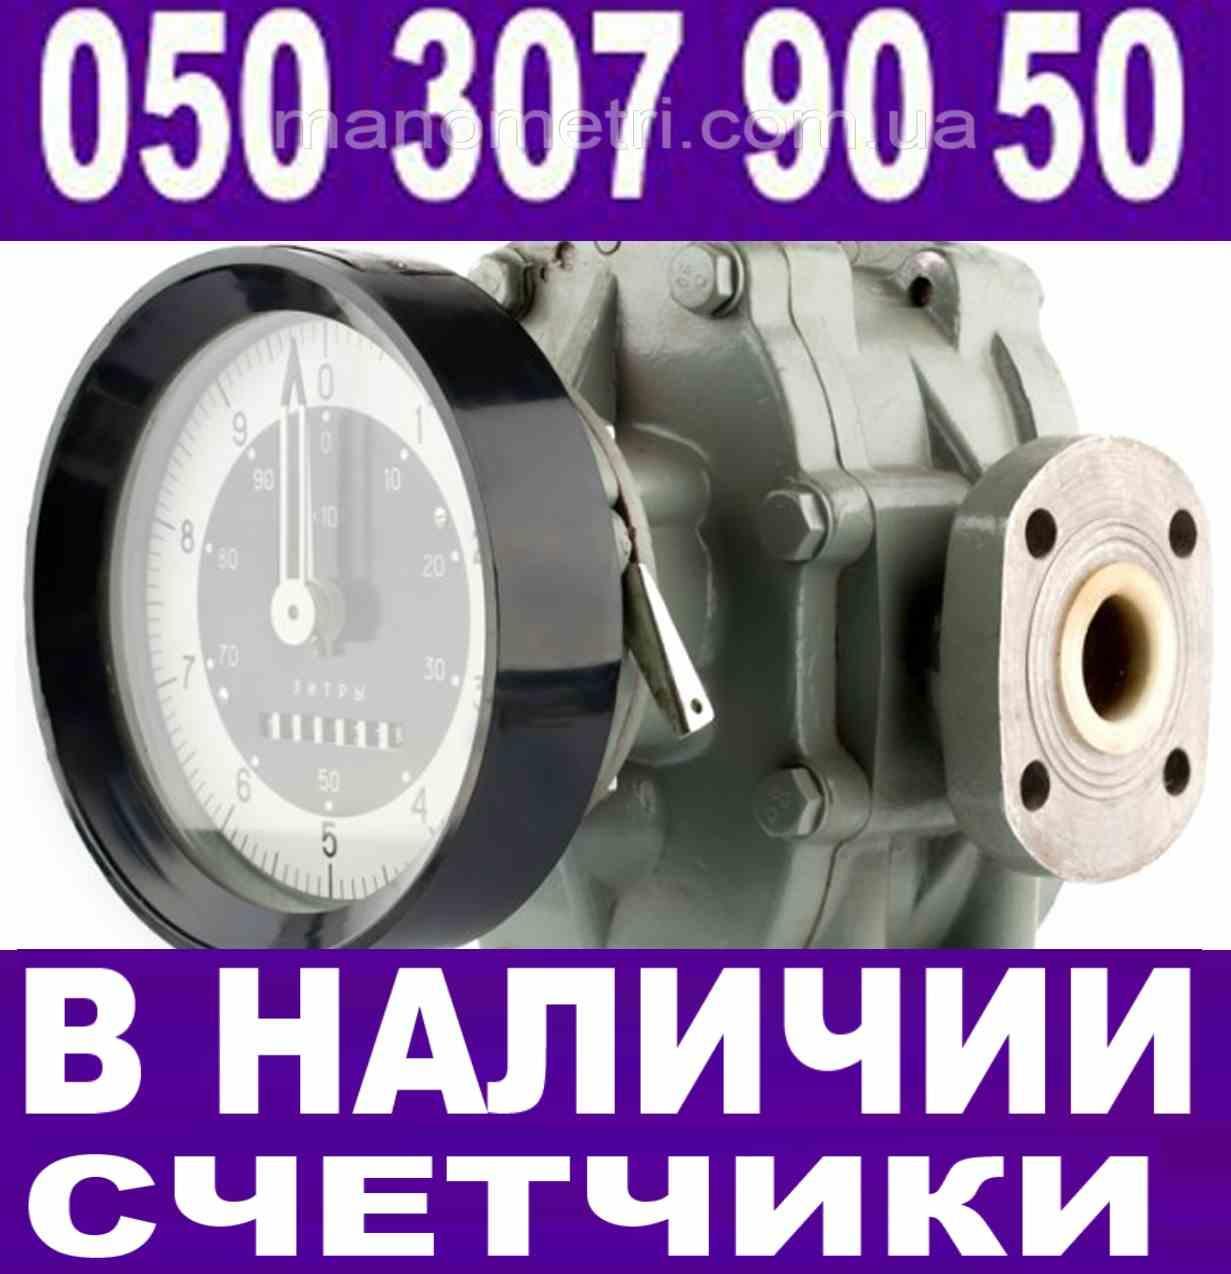 Счетчик жидкости ППО 40 Счетчики топлива ППО 40 ШЖУ Поверка Цена_050`307~90`50